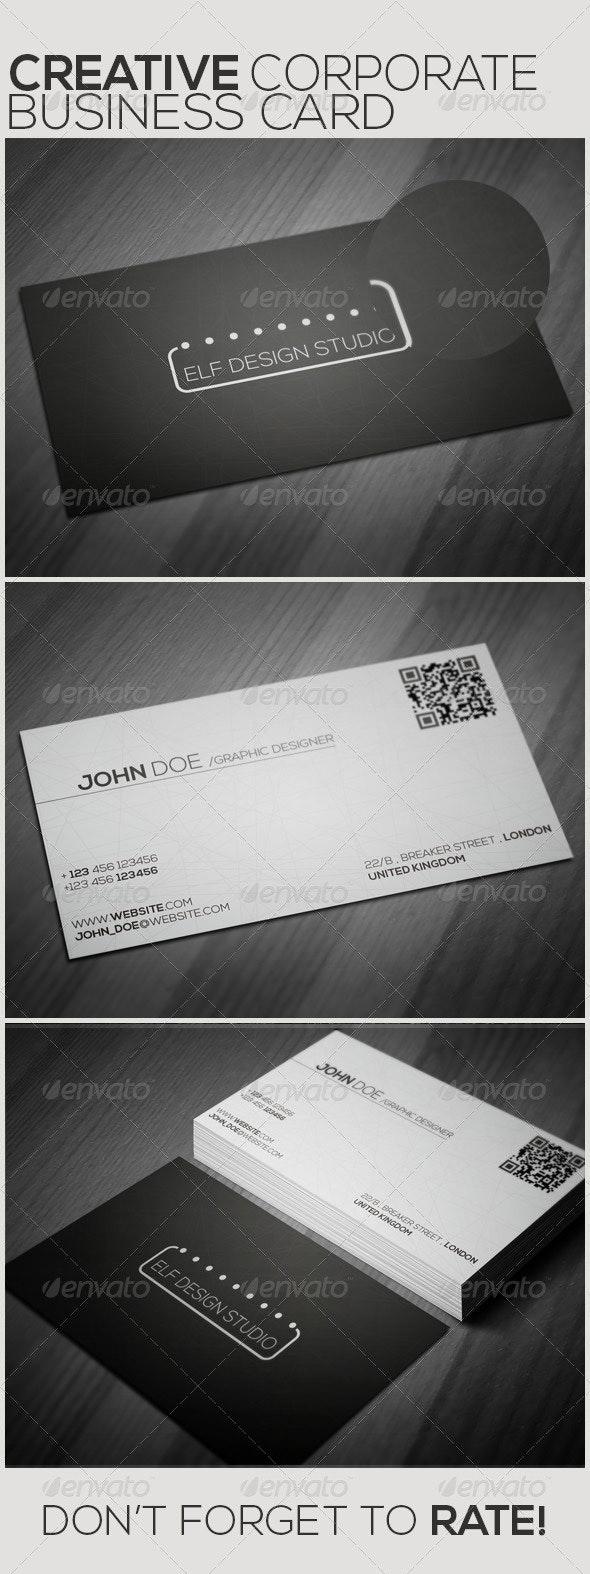 Corporate Creative Business Card - Corporate Business Cards